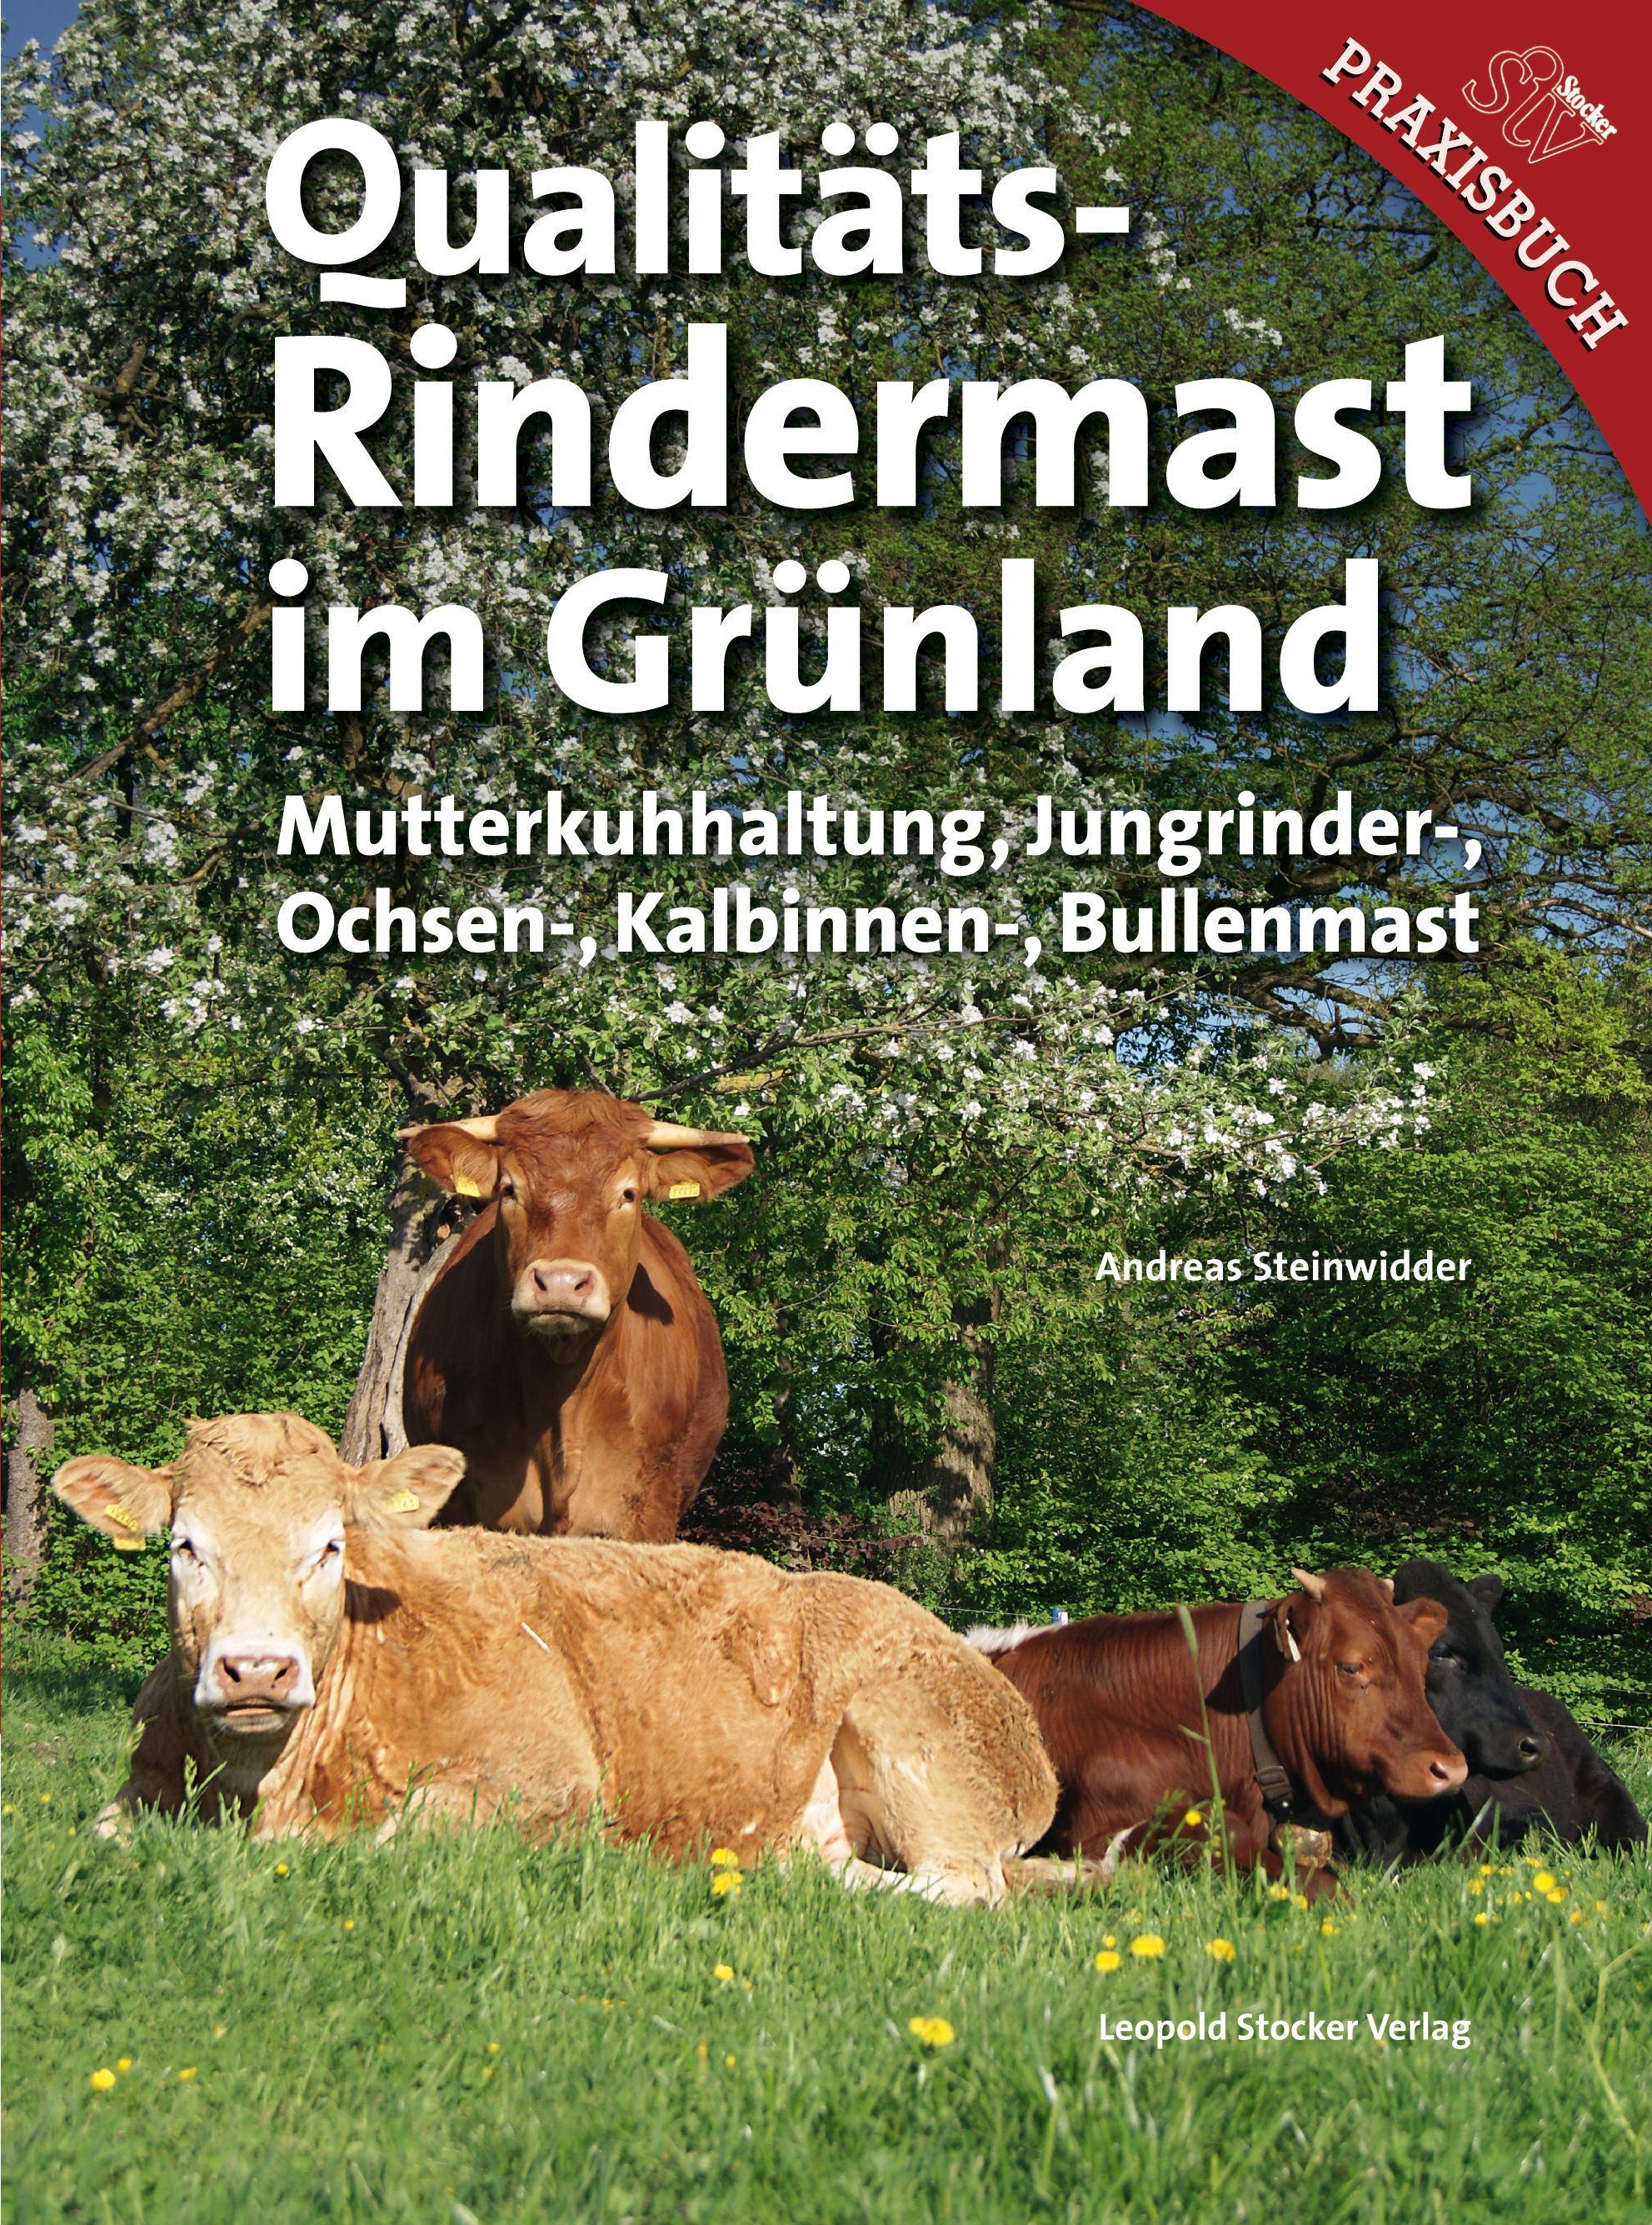 Qualit�ts-Rindermast im Gr�nland